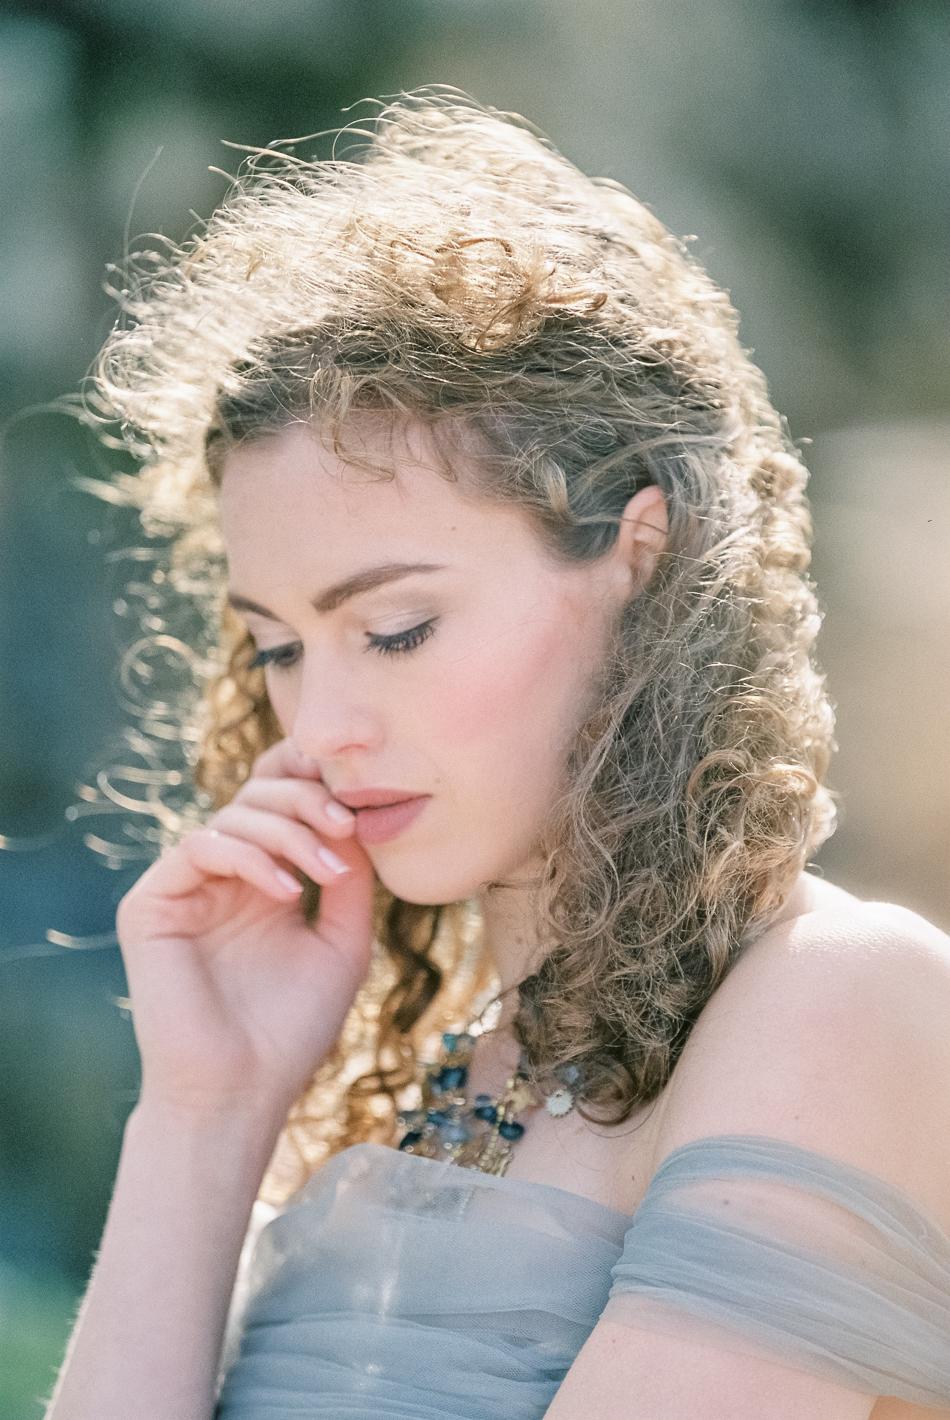 Chen-Sands-Film-Photography-Portraits-Bride-Beauty-Ireland-13.jpg